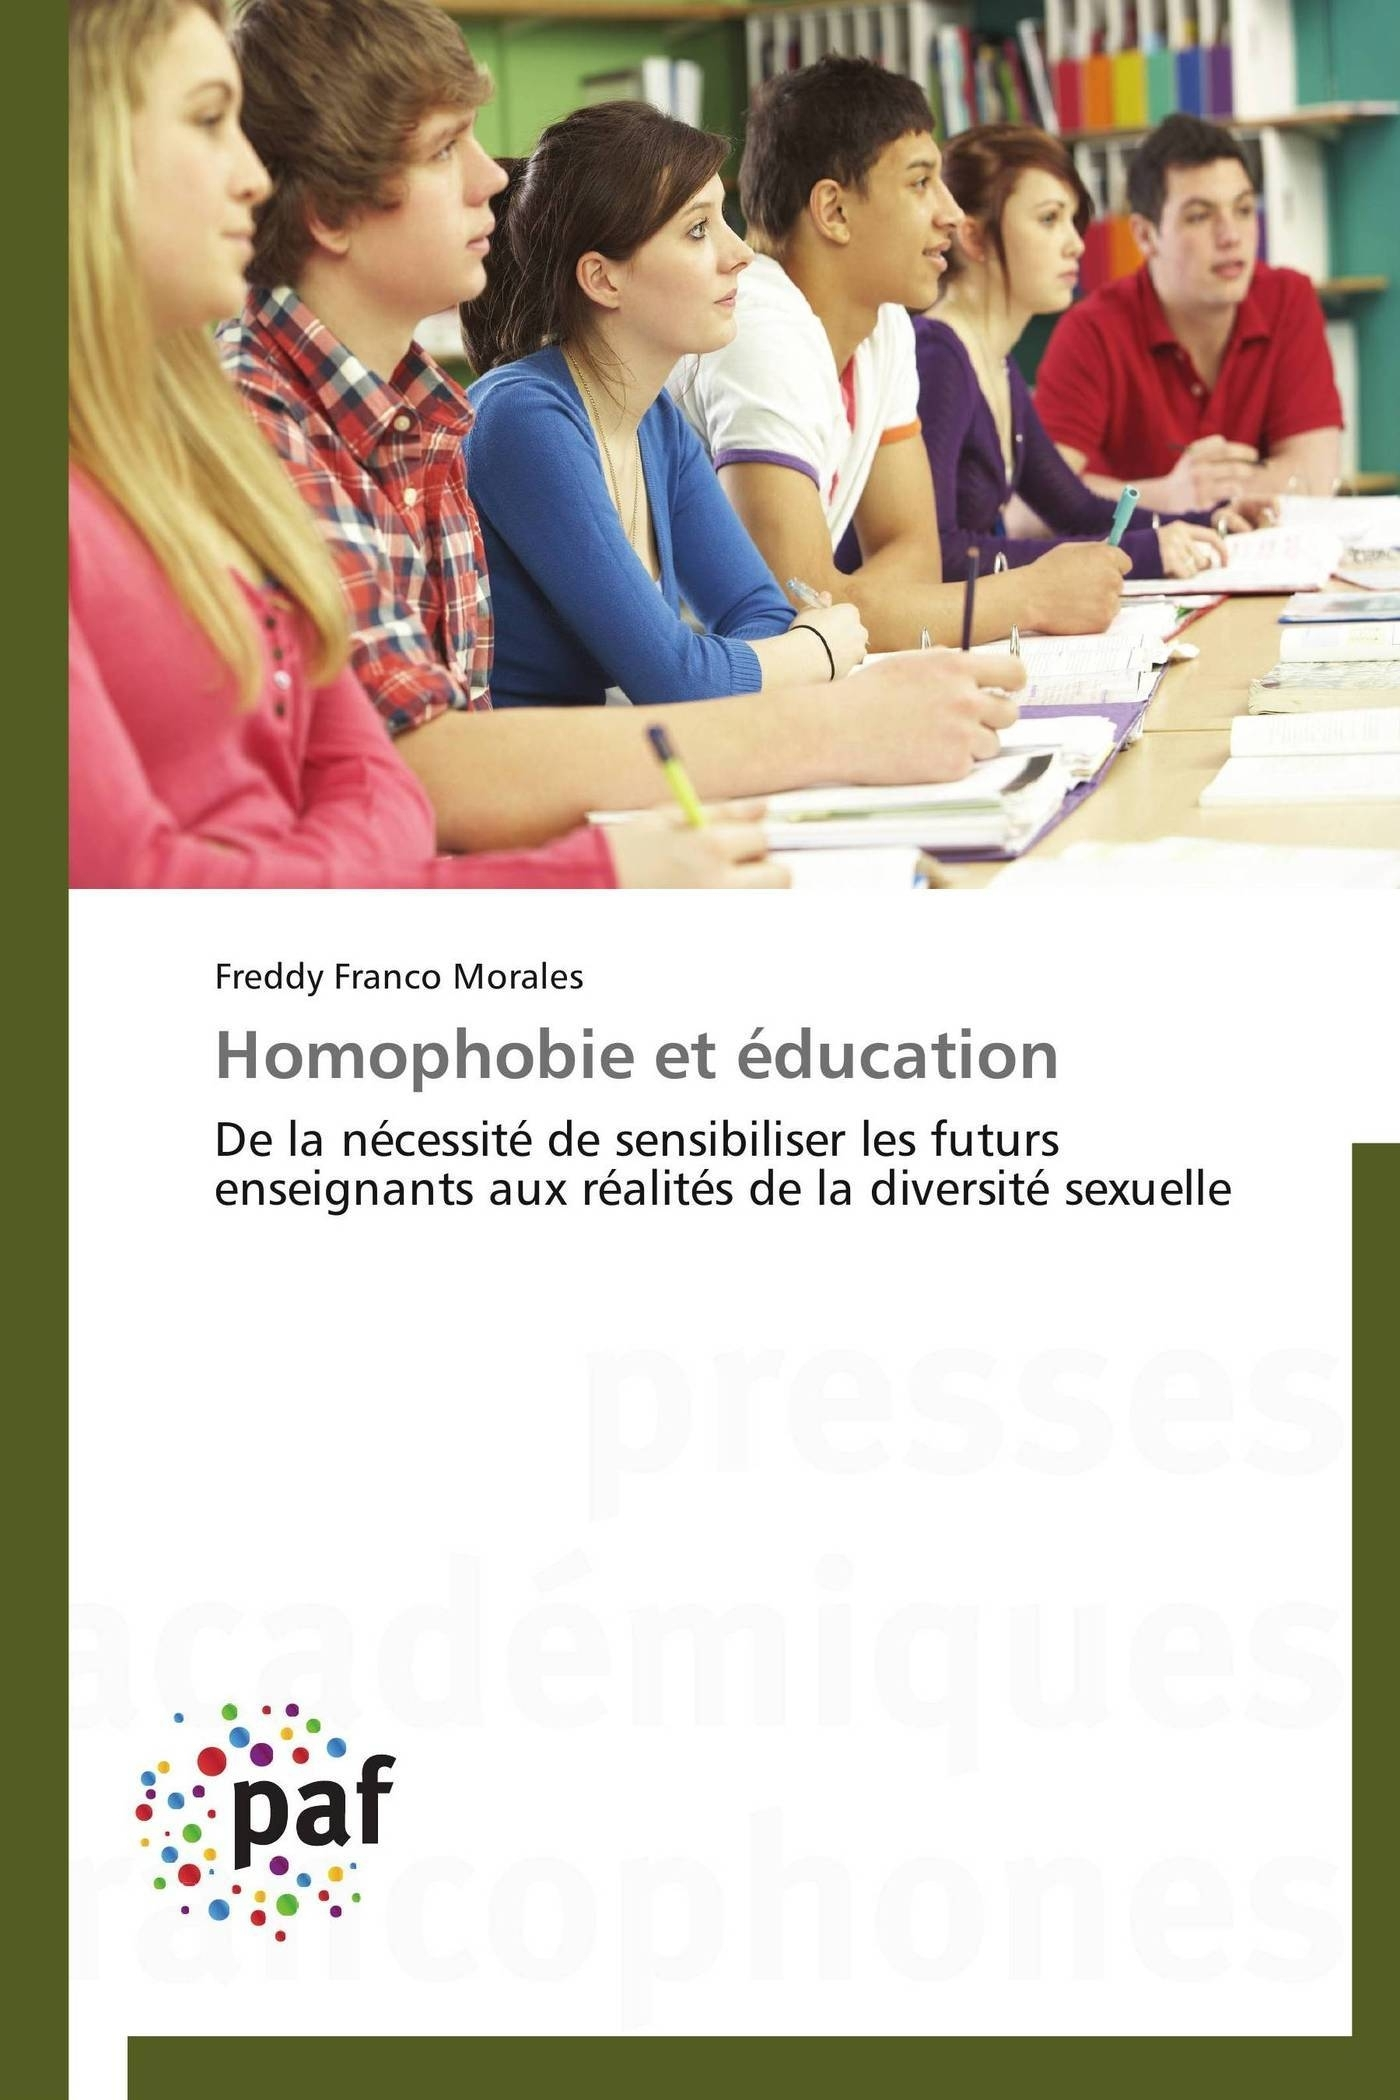 HOMOPHOBIE ET EDUCATION